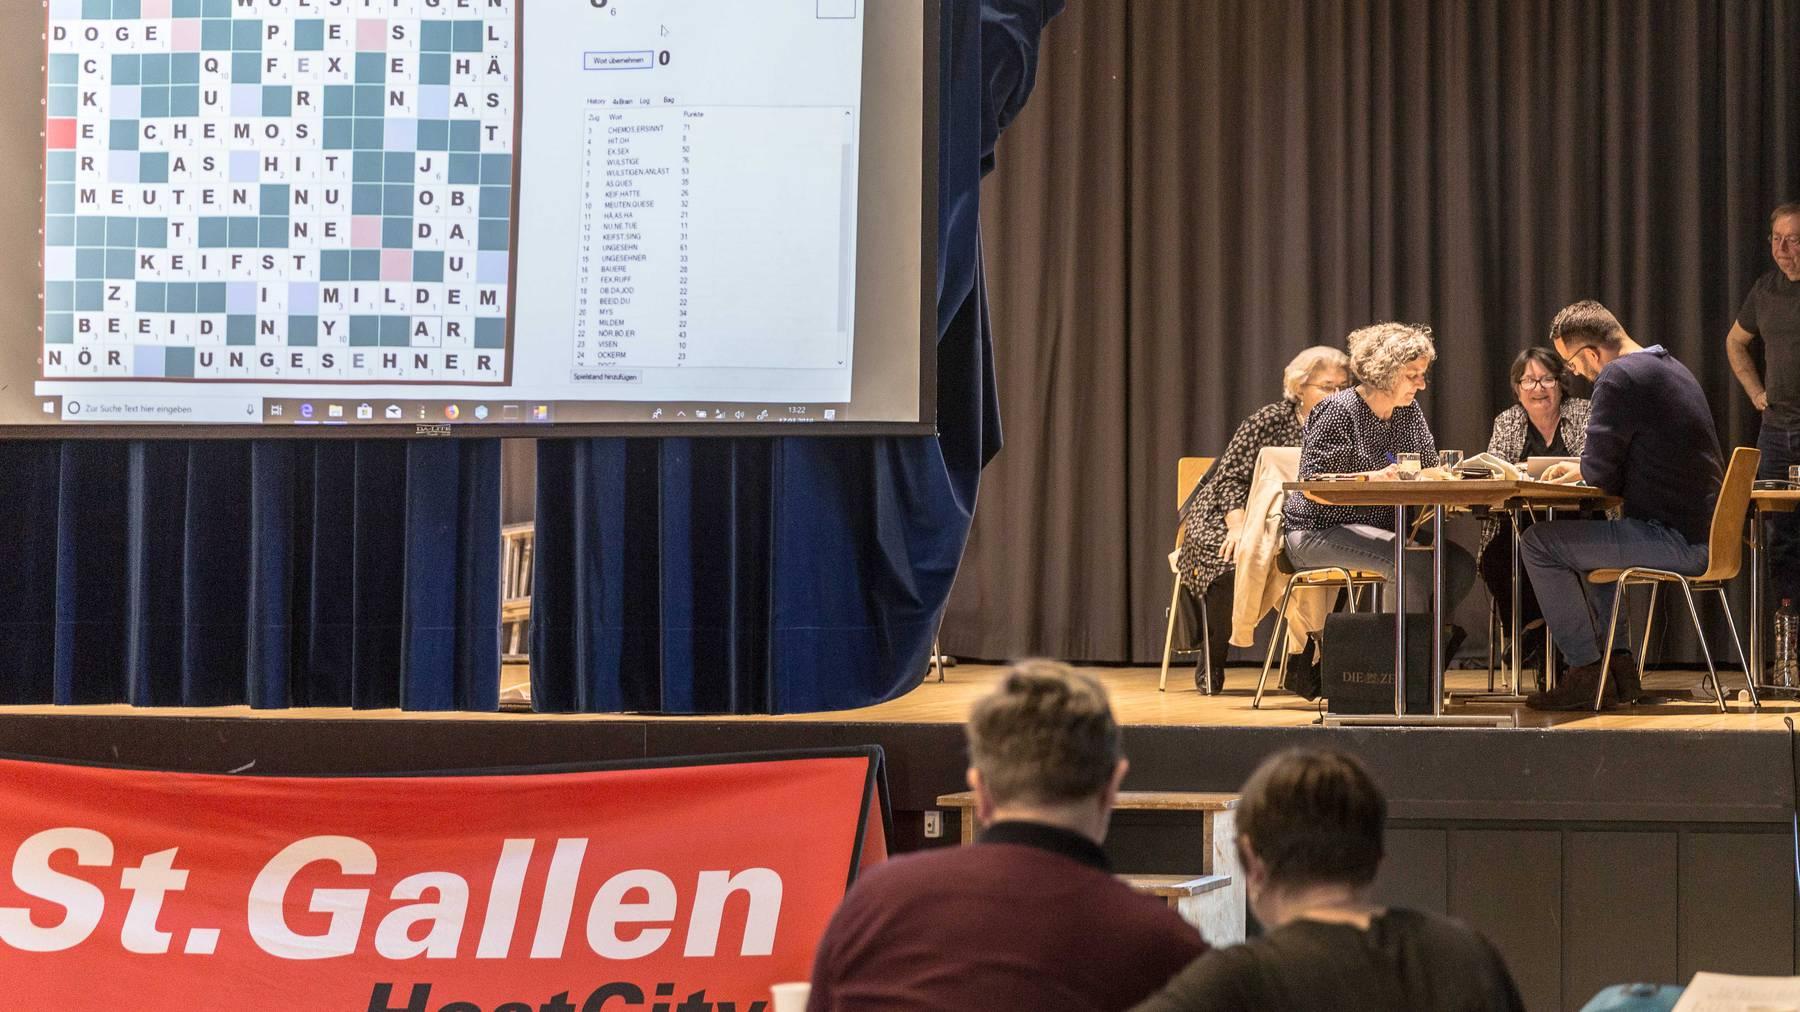 Am Scrabble-Turnier in St.Gallen messen sich internationale Scrabble-Grössen.